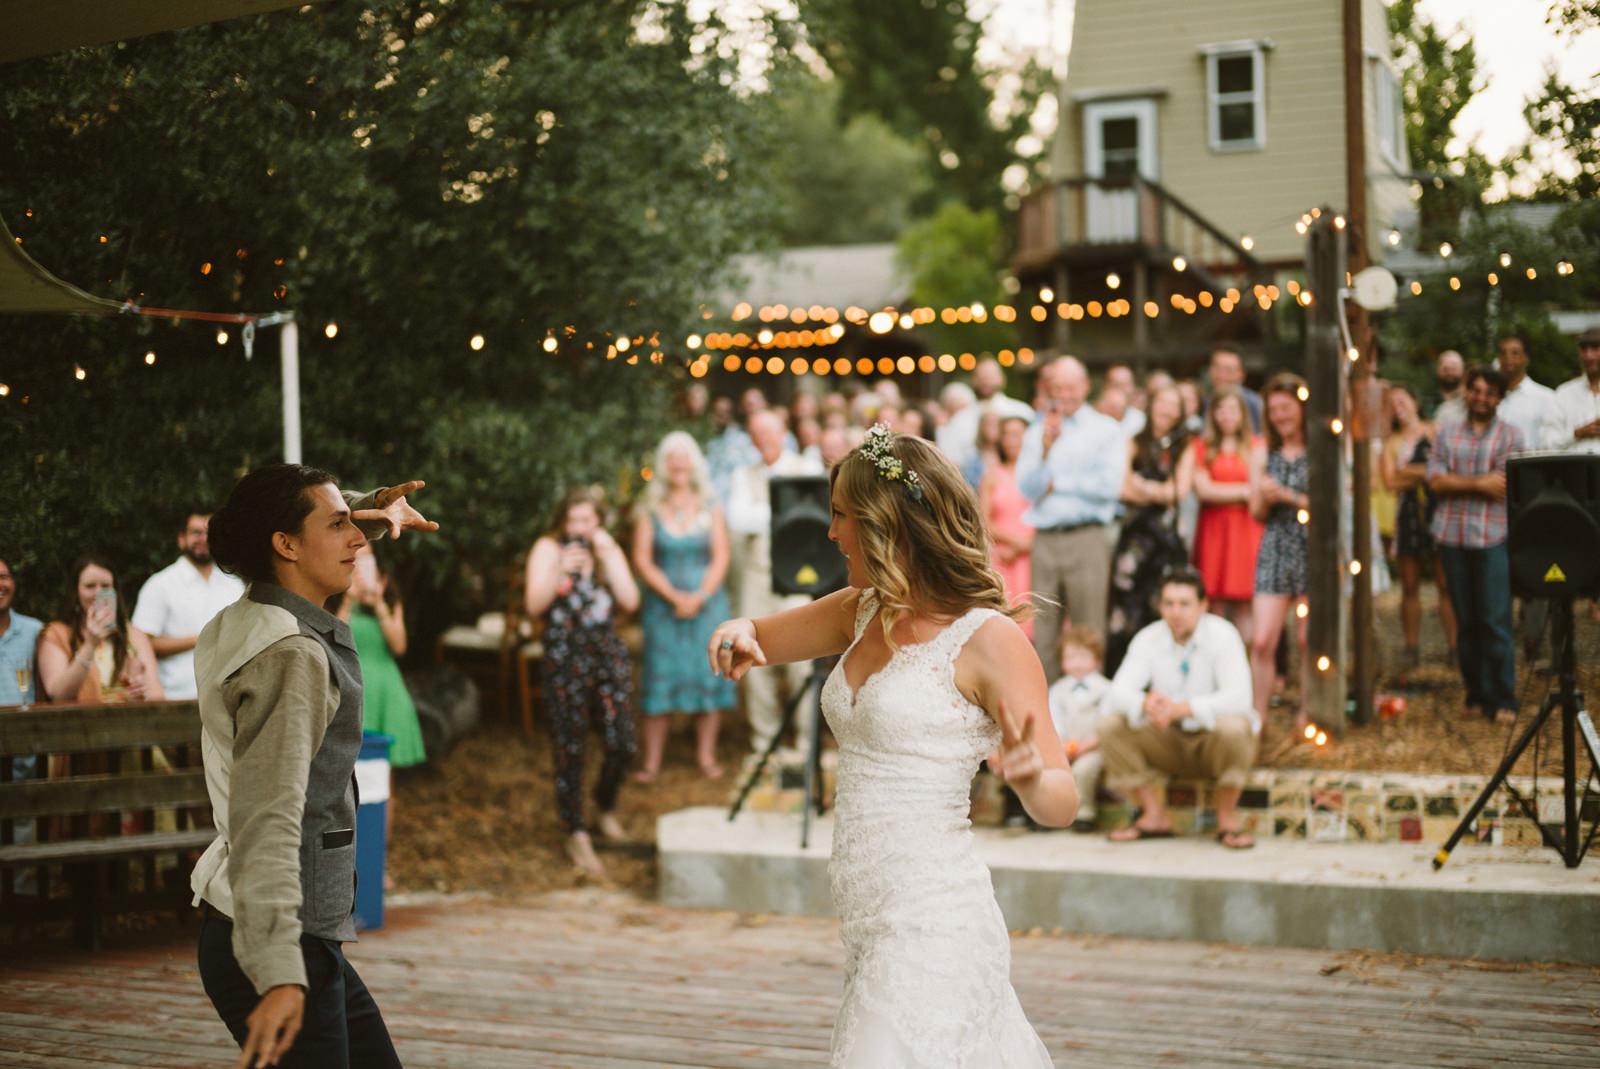 rivers-bend-retreat-wedding-094 RIVER'S BEND RETREAT WEDDING